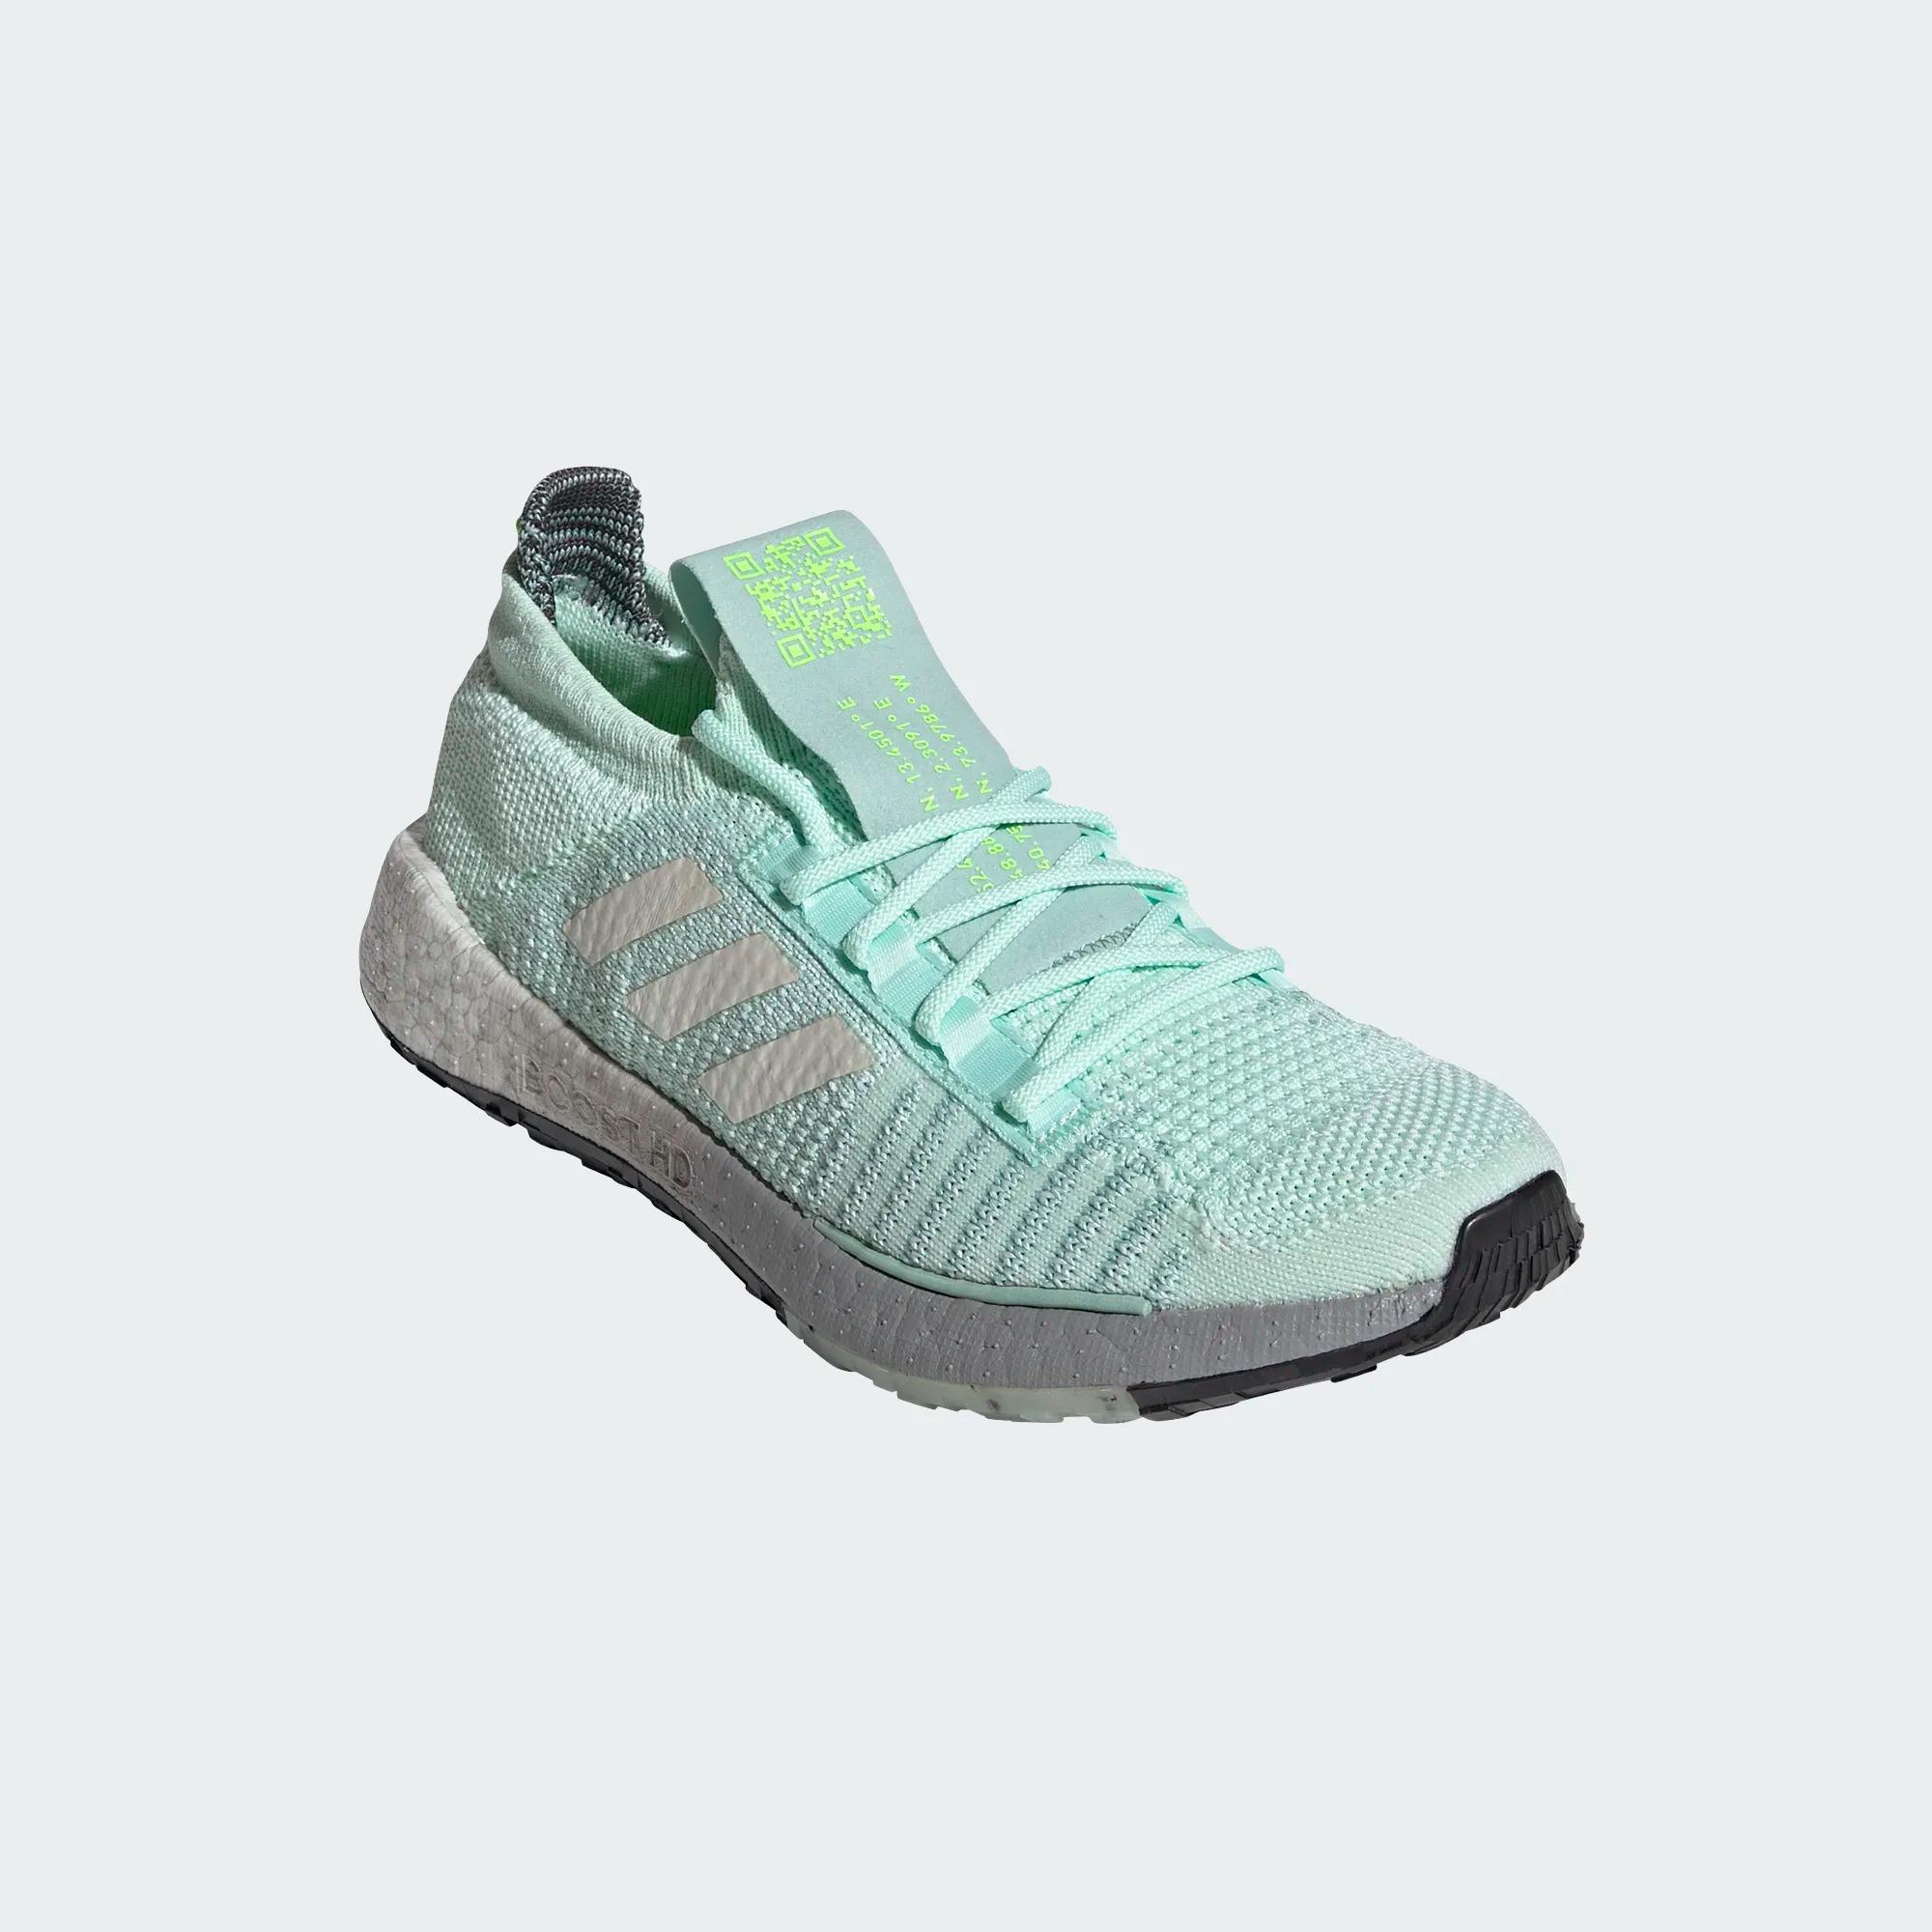 Adidas PULSEBOOST HD Damen Laufschuh